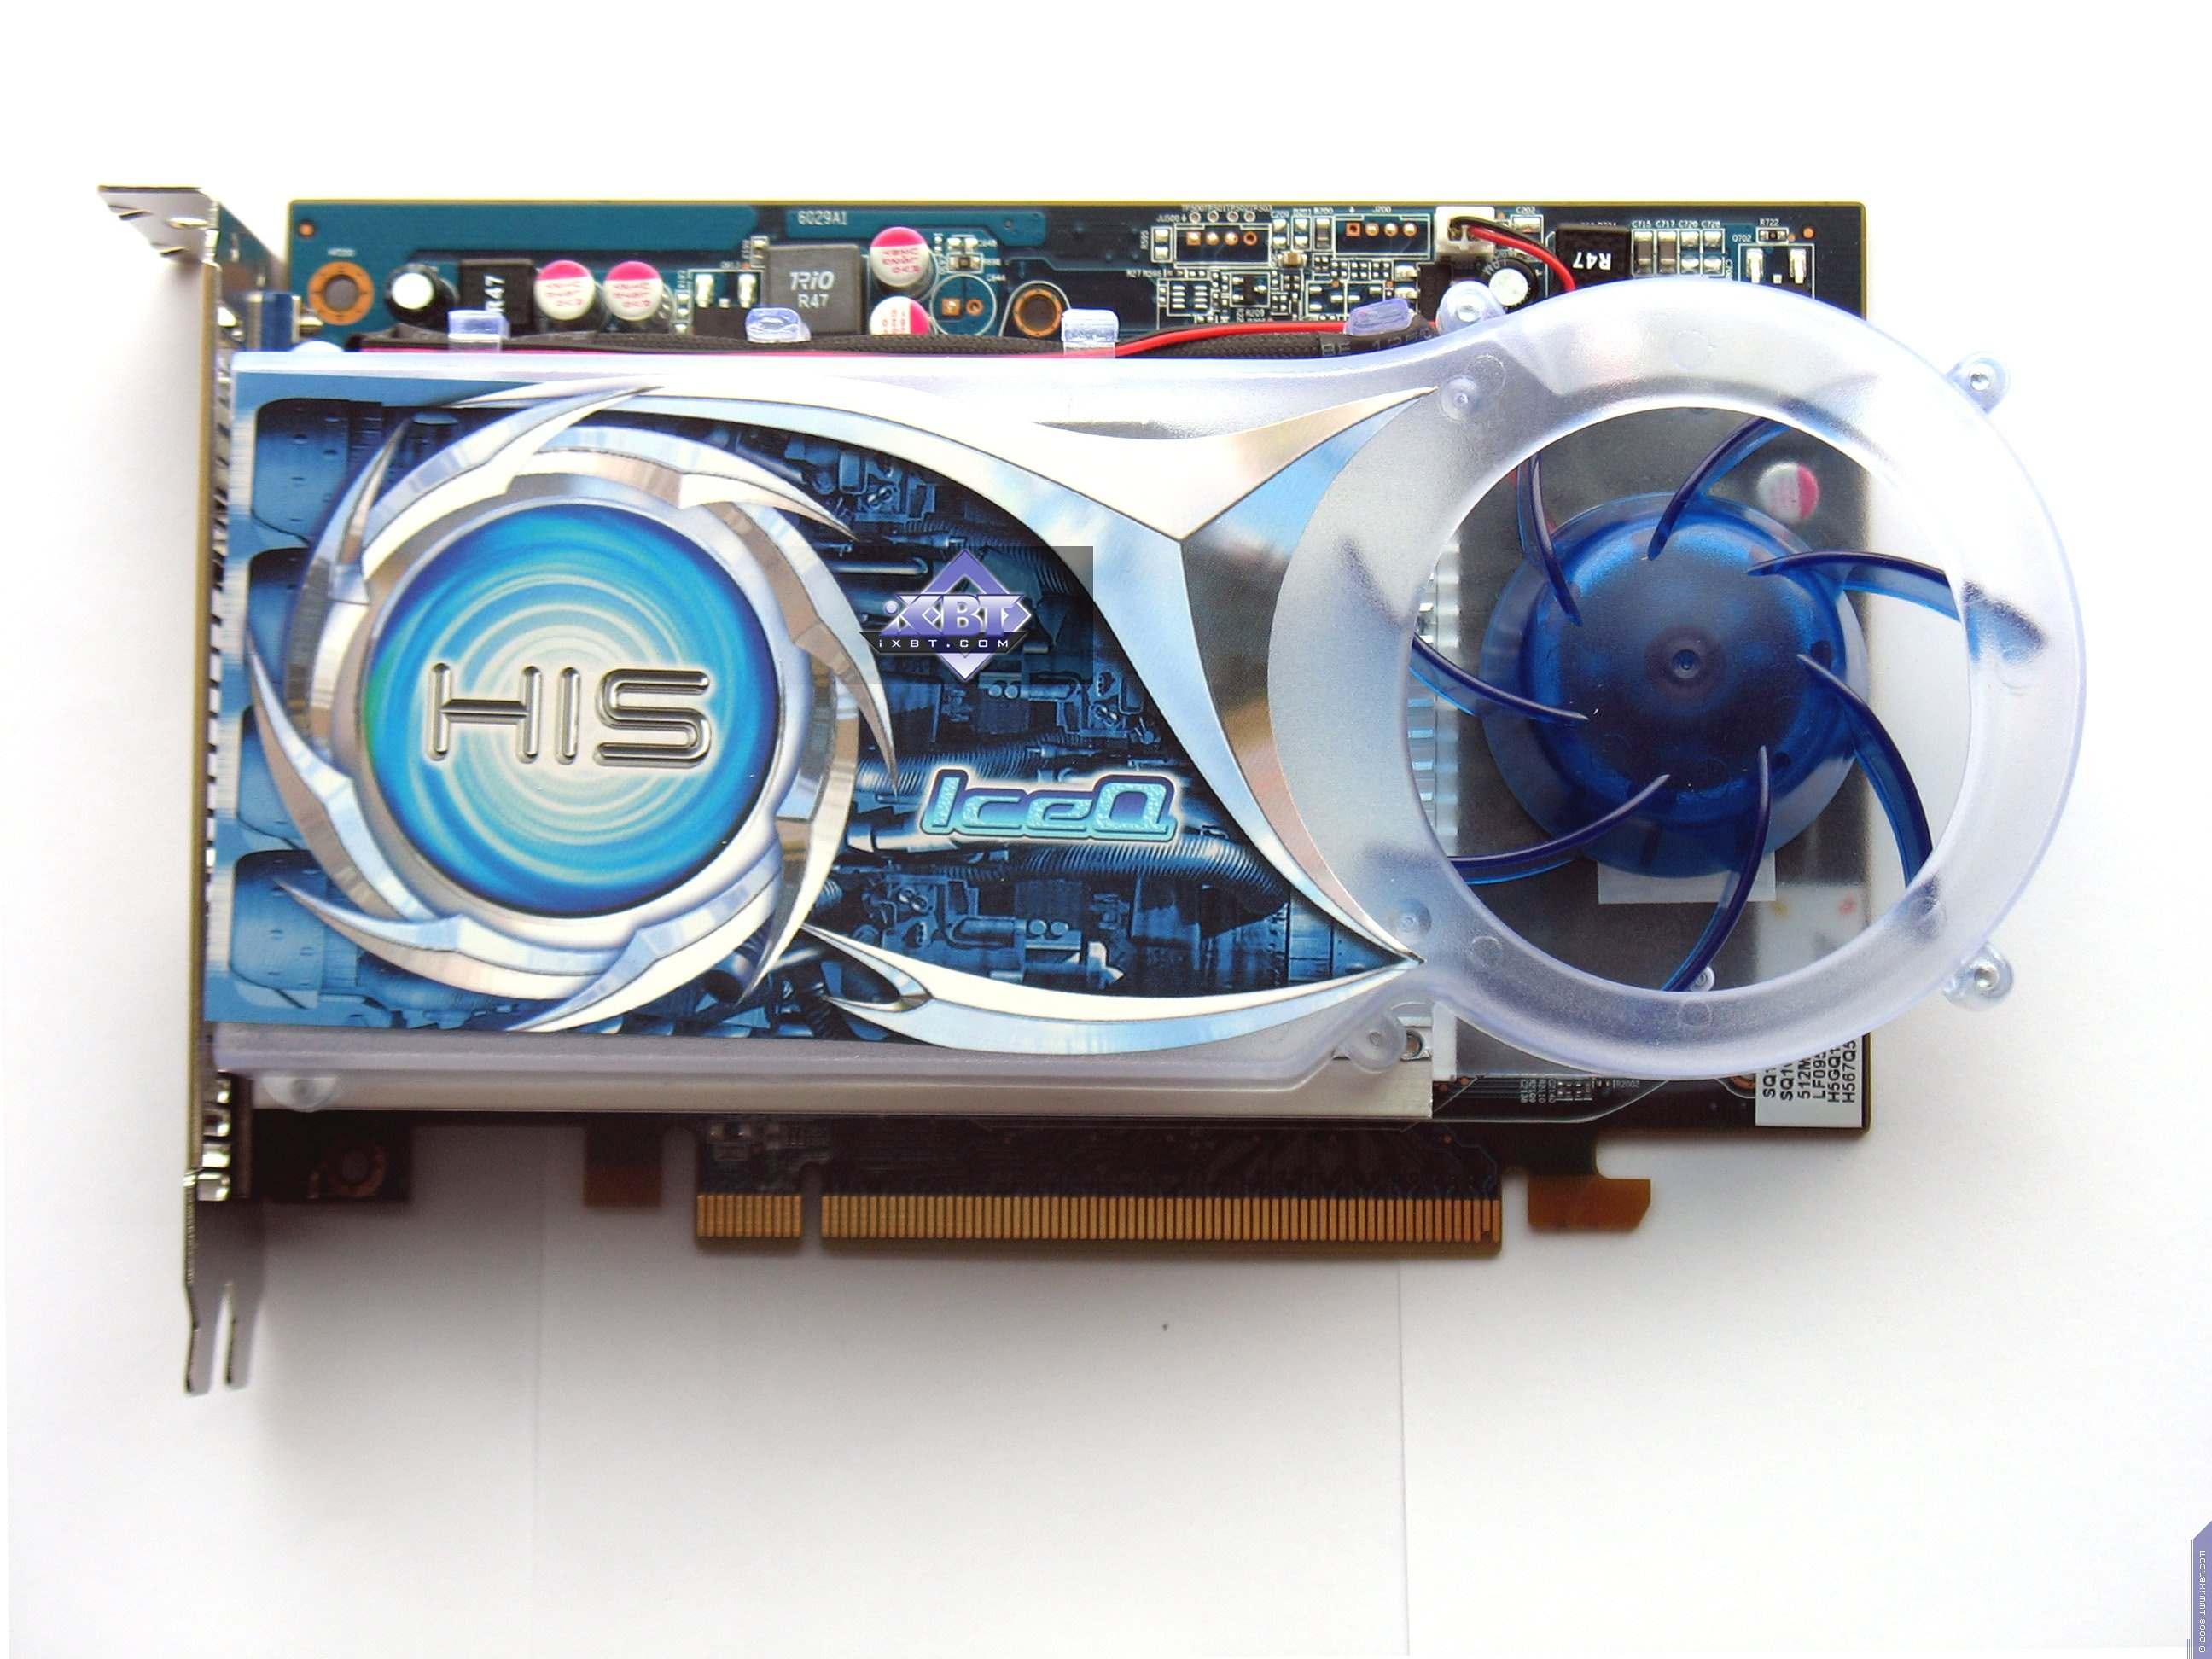 Sapphire radeon hd 5670 video adapter скачать драйвер